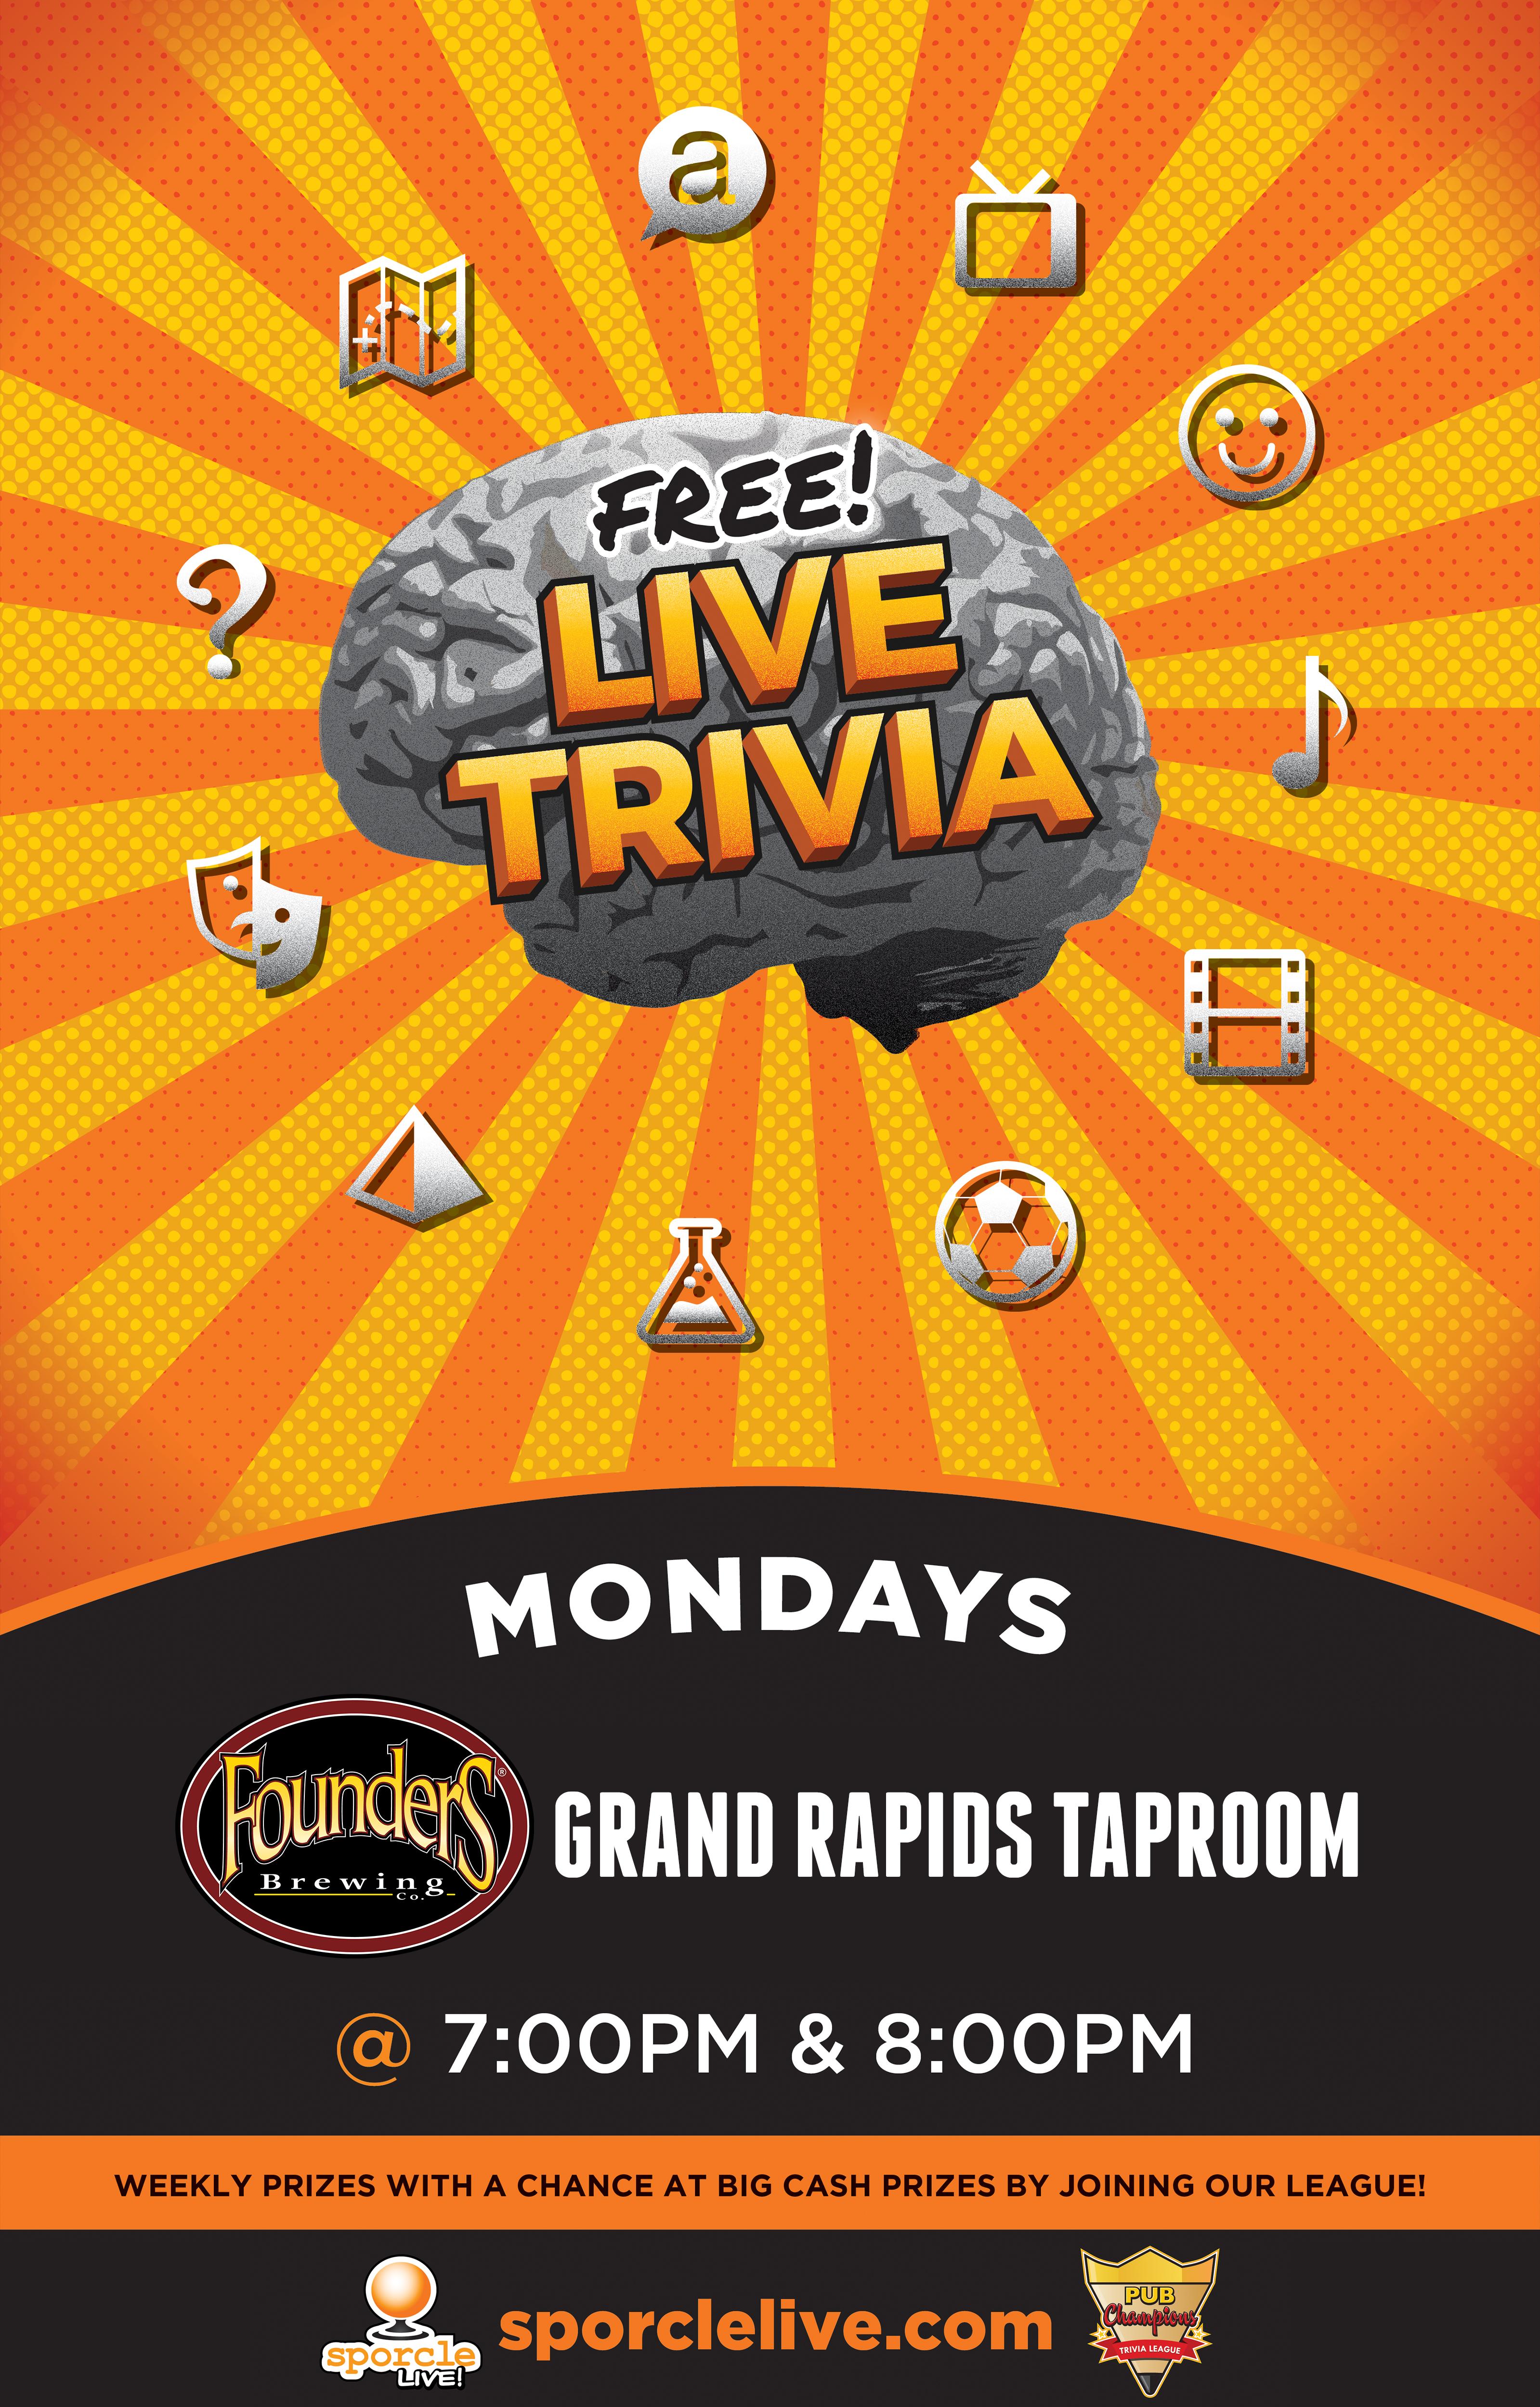 Free Live Trivia Mondays event poster